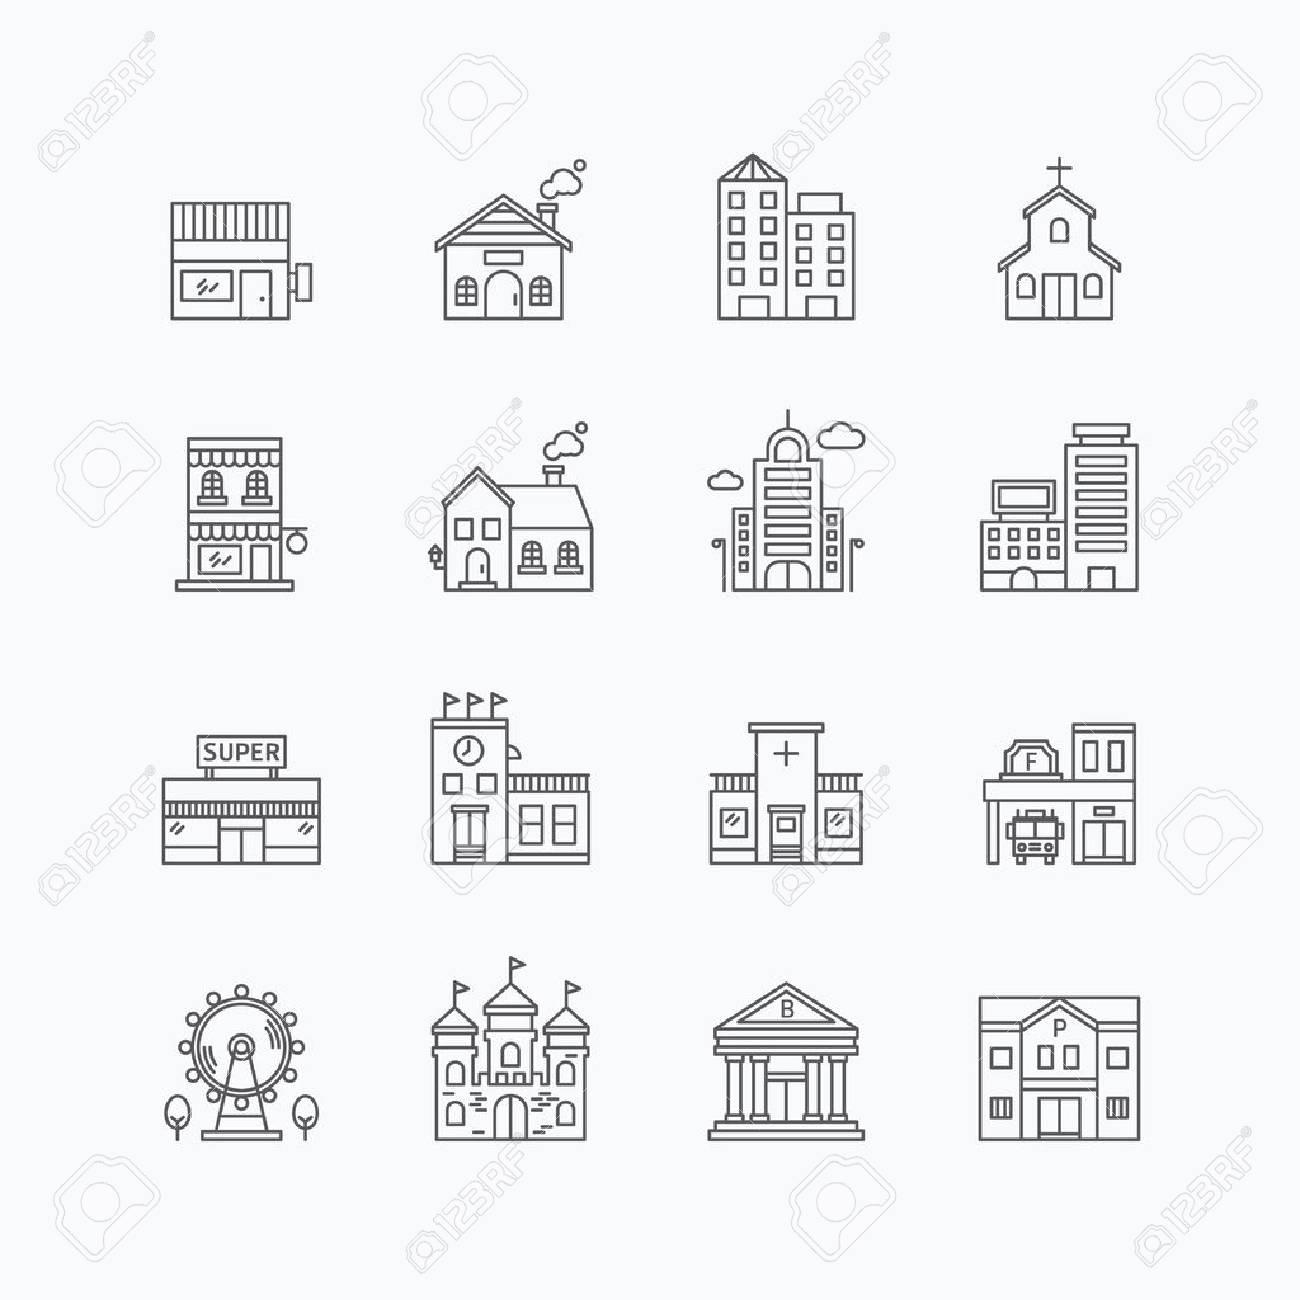 vector linear web icons set - buildings collection of flat line city design elements. Standard-Bild - 43194422